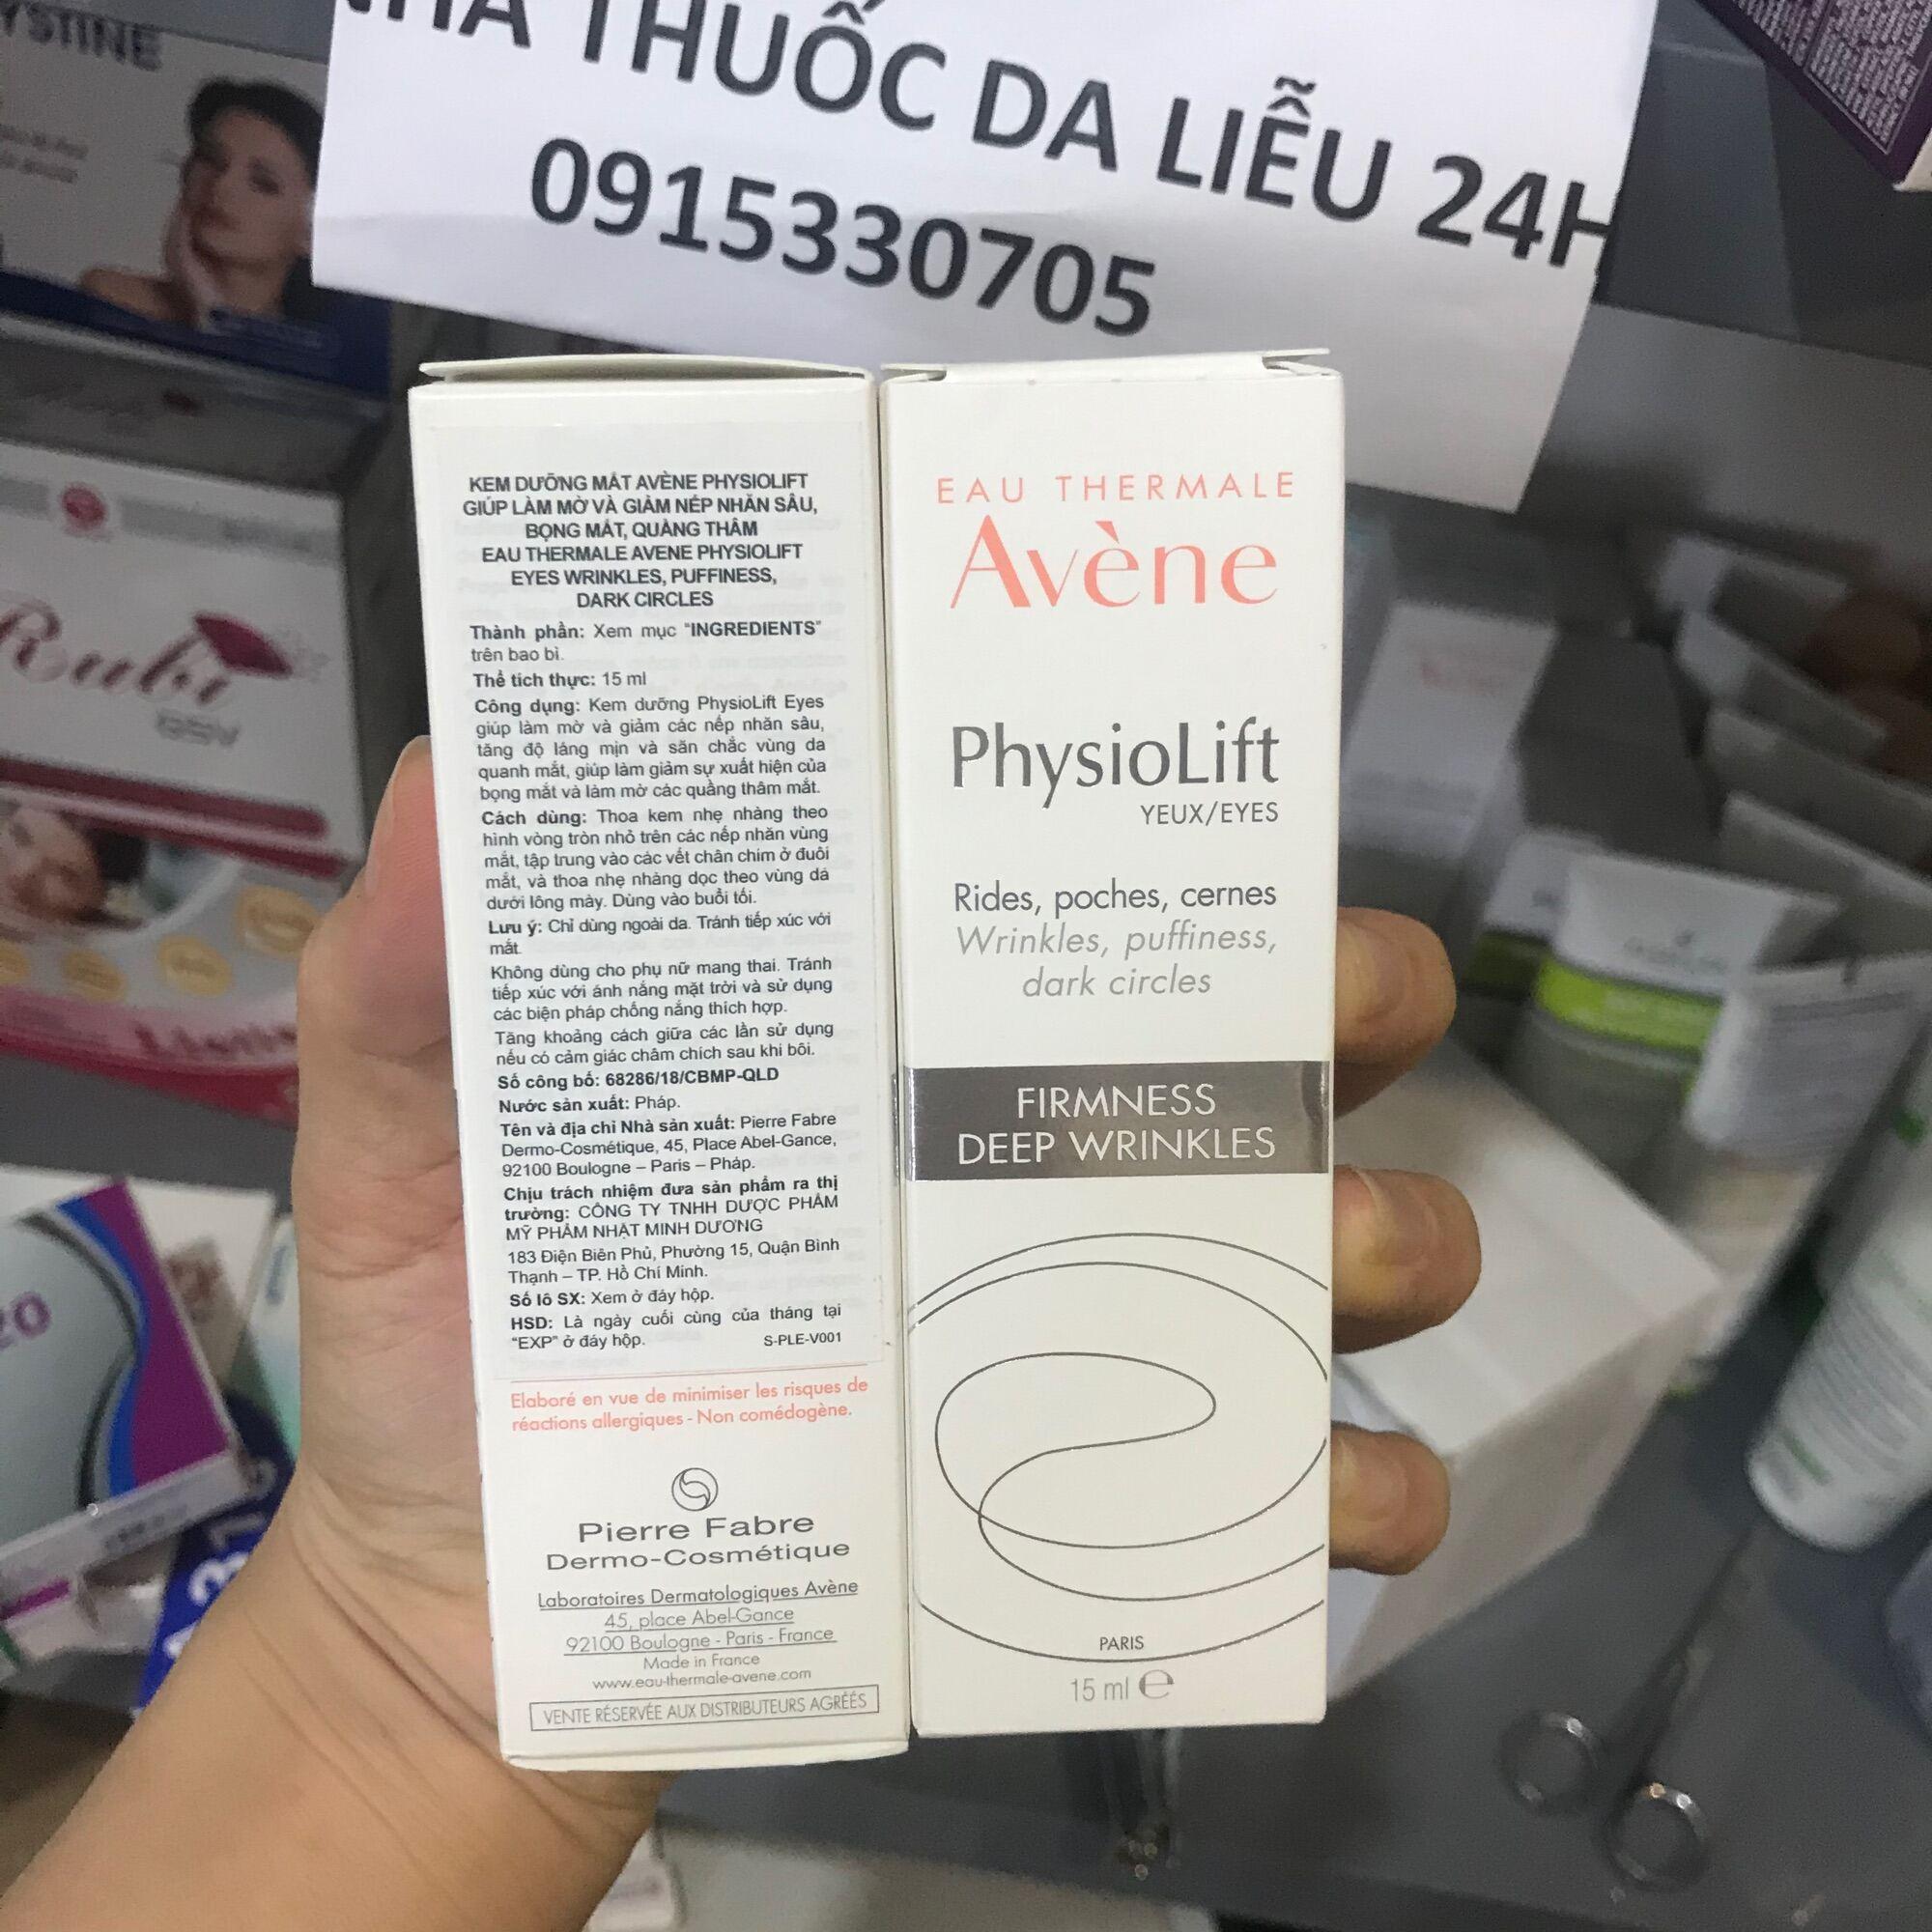 Kem chống lão hoá Mắt Avene Physiolift eye 15ml giá rẻ